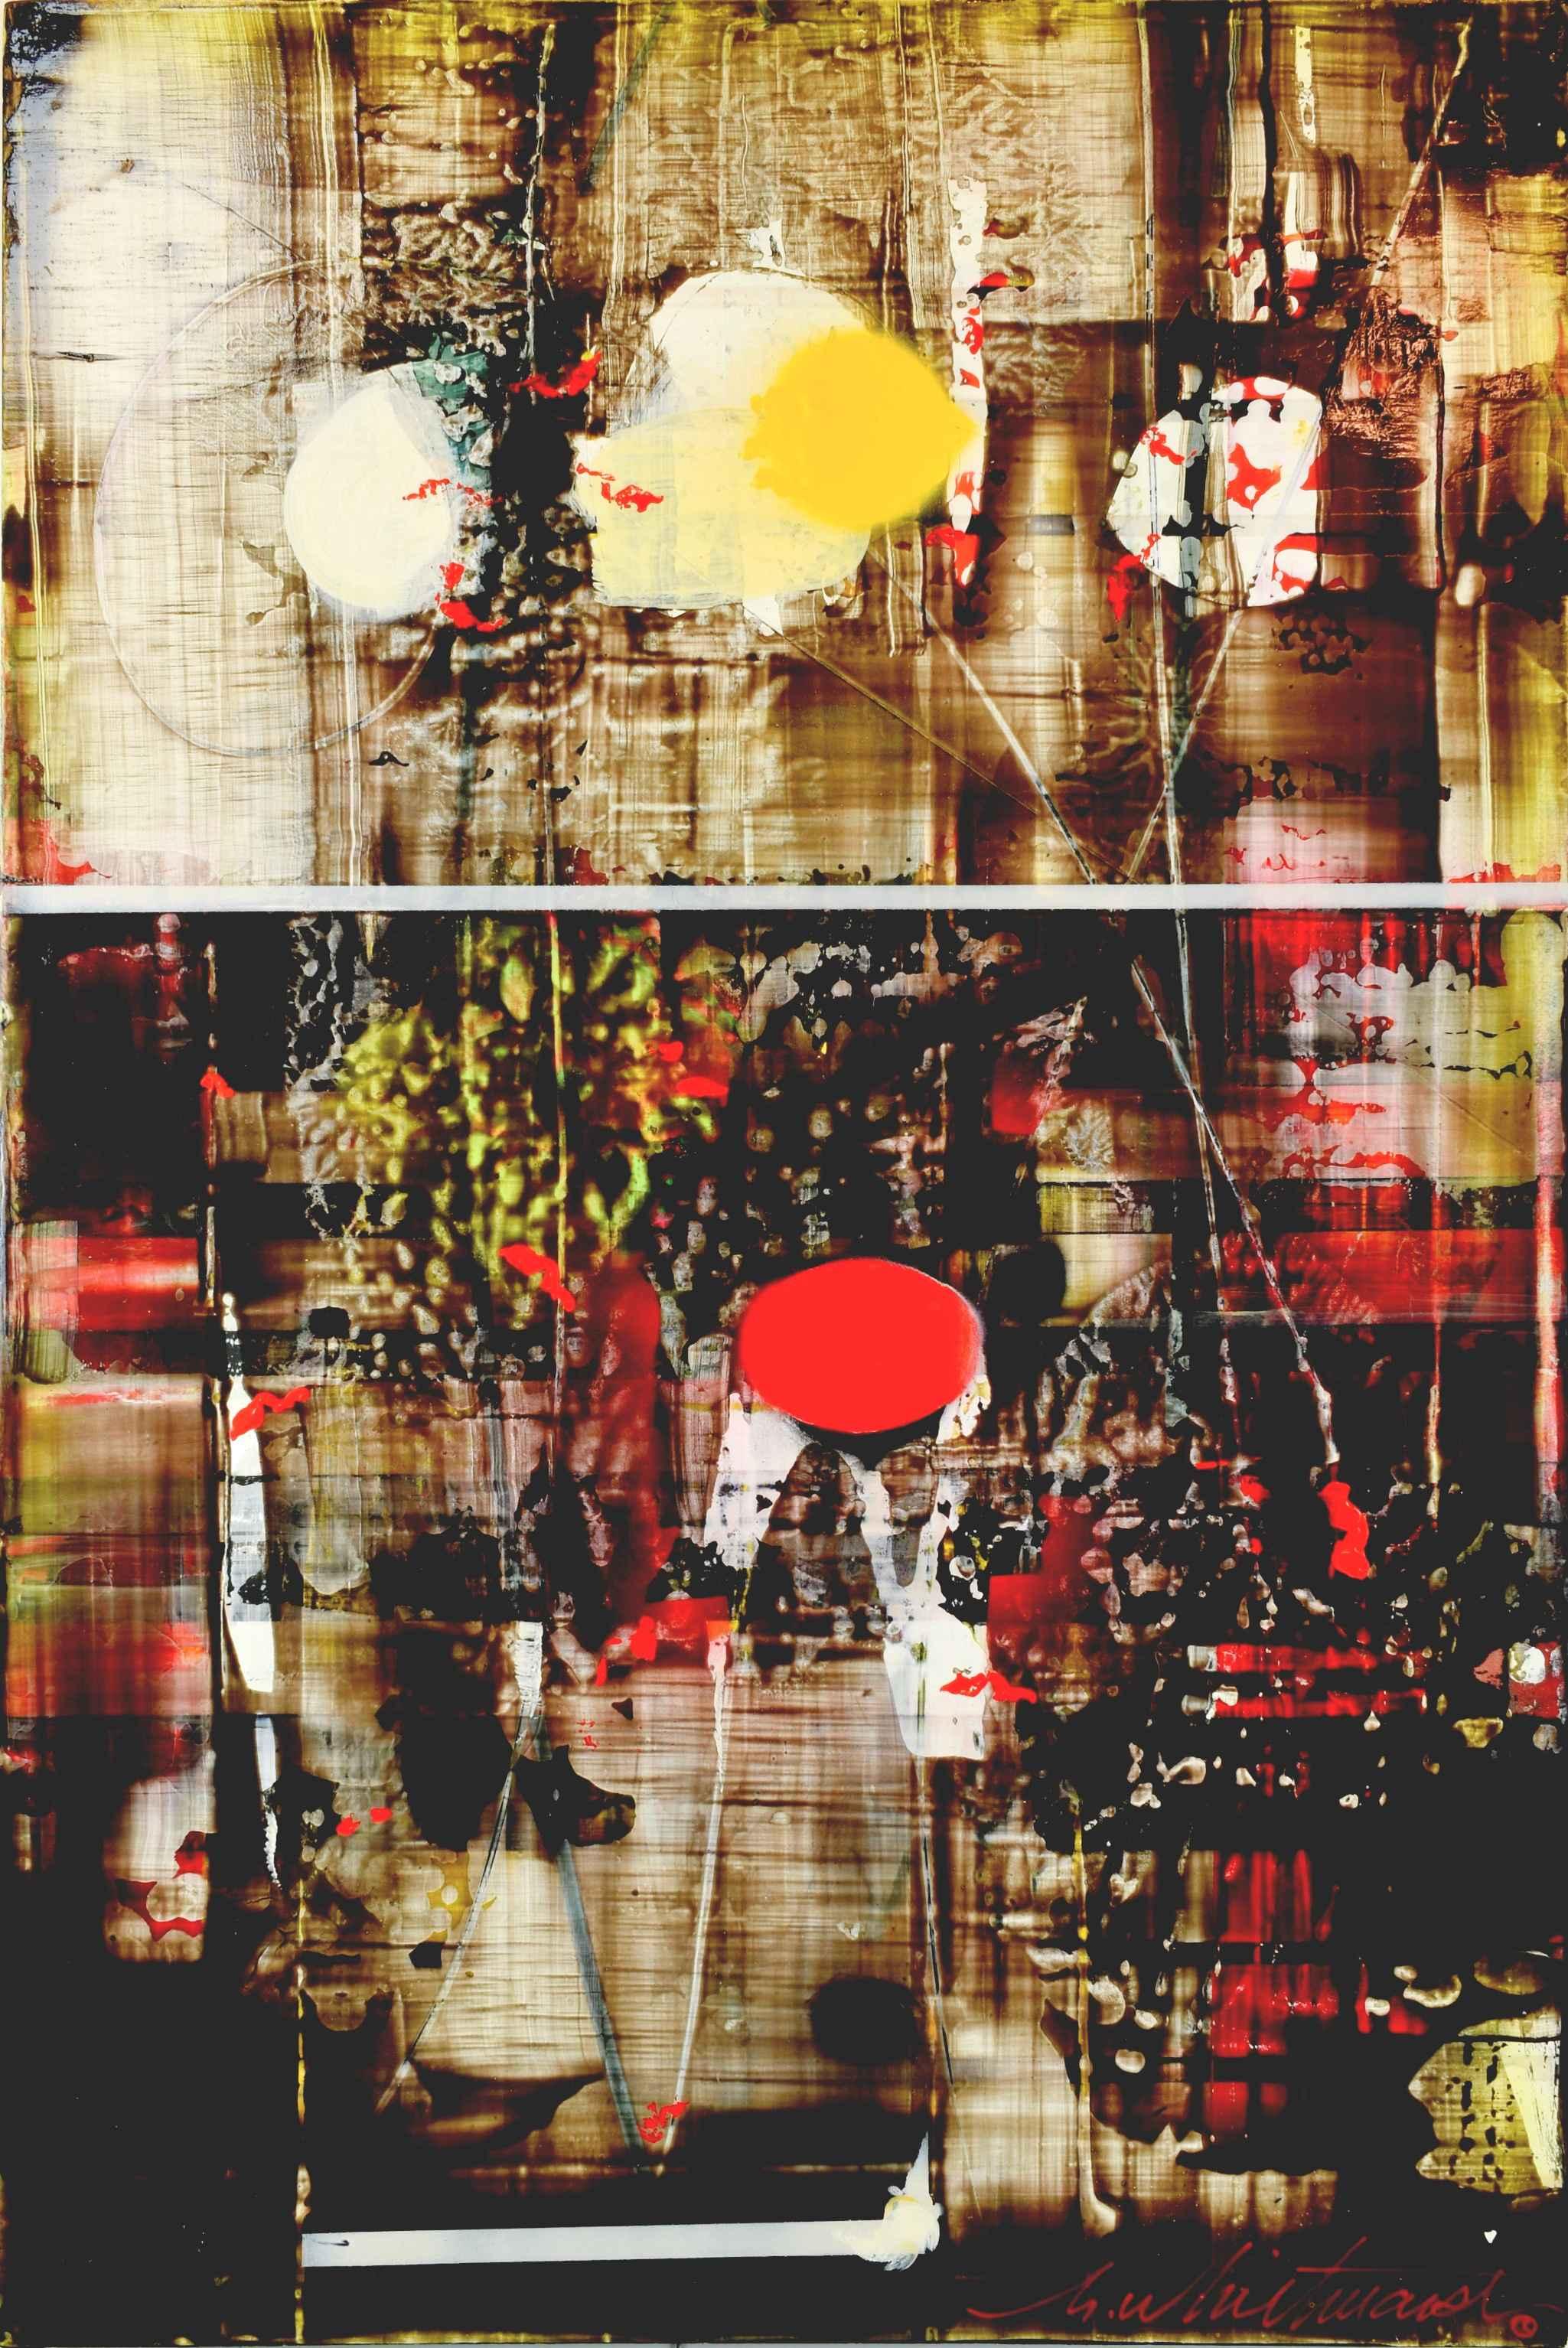 Sunny by  Mark Whitmarsh - Masterpiece Online